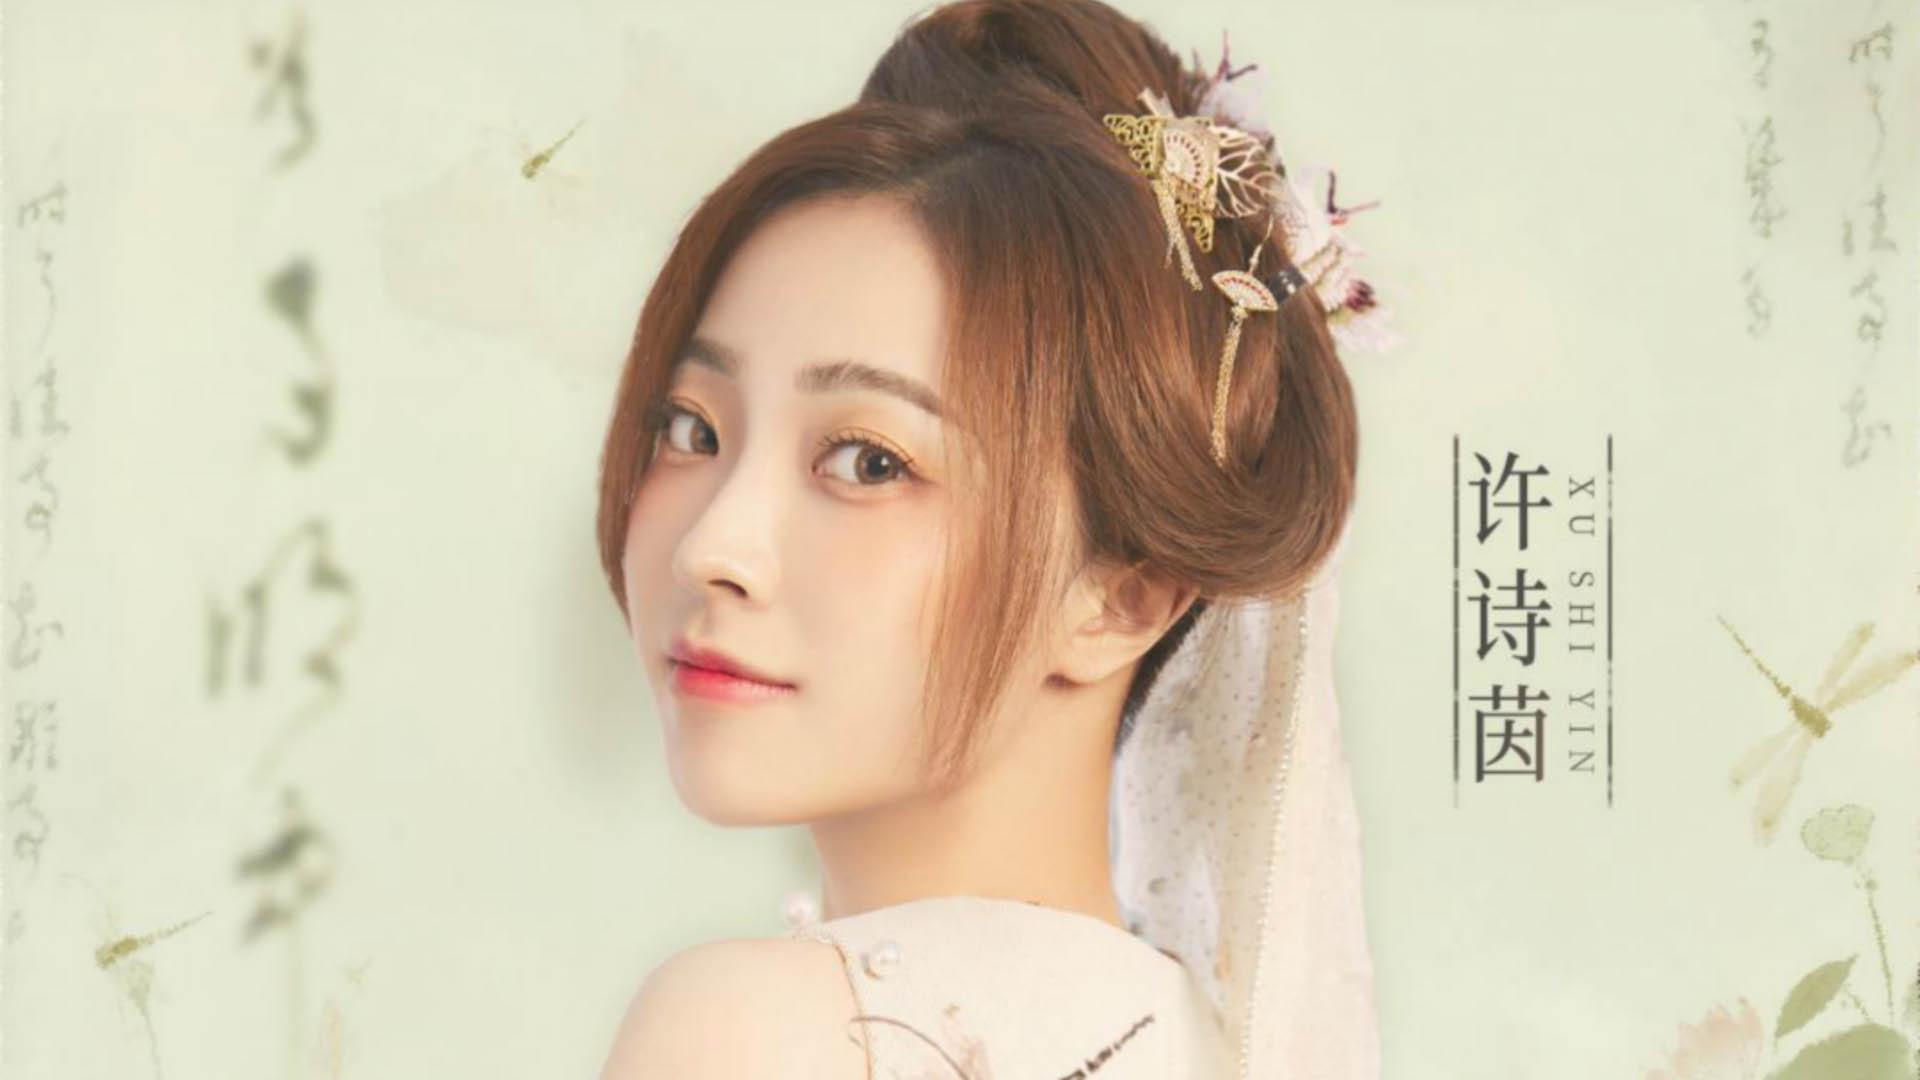 SING许诗茵生日单曲《记夏》上线 唯美古风演绎初夏时光